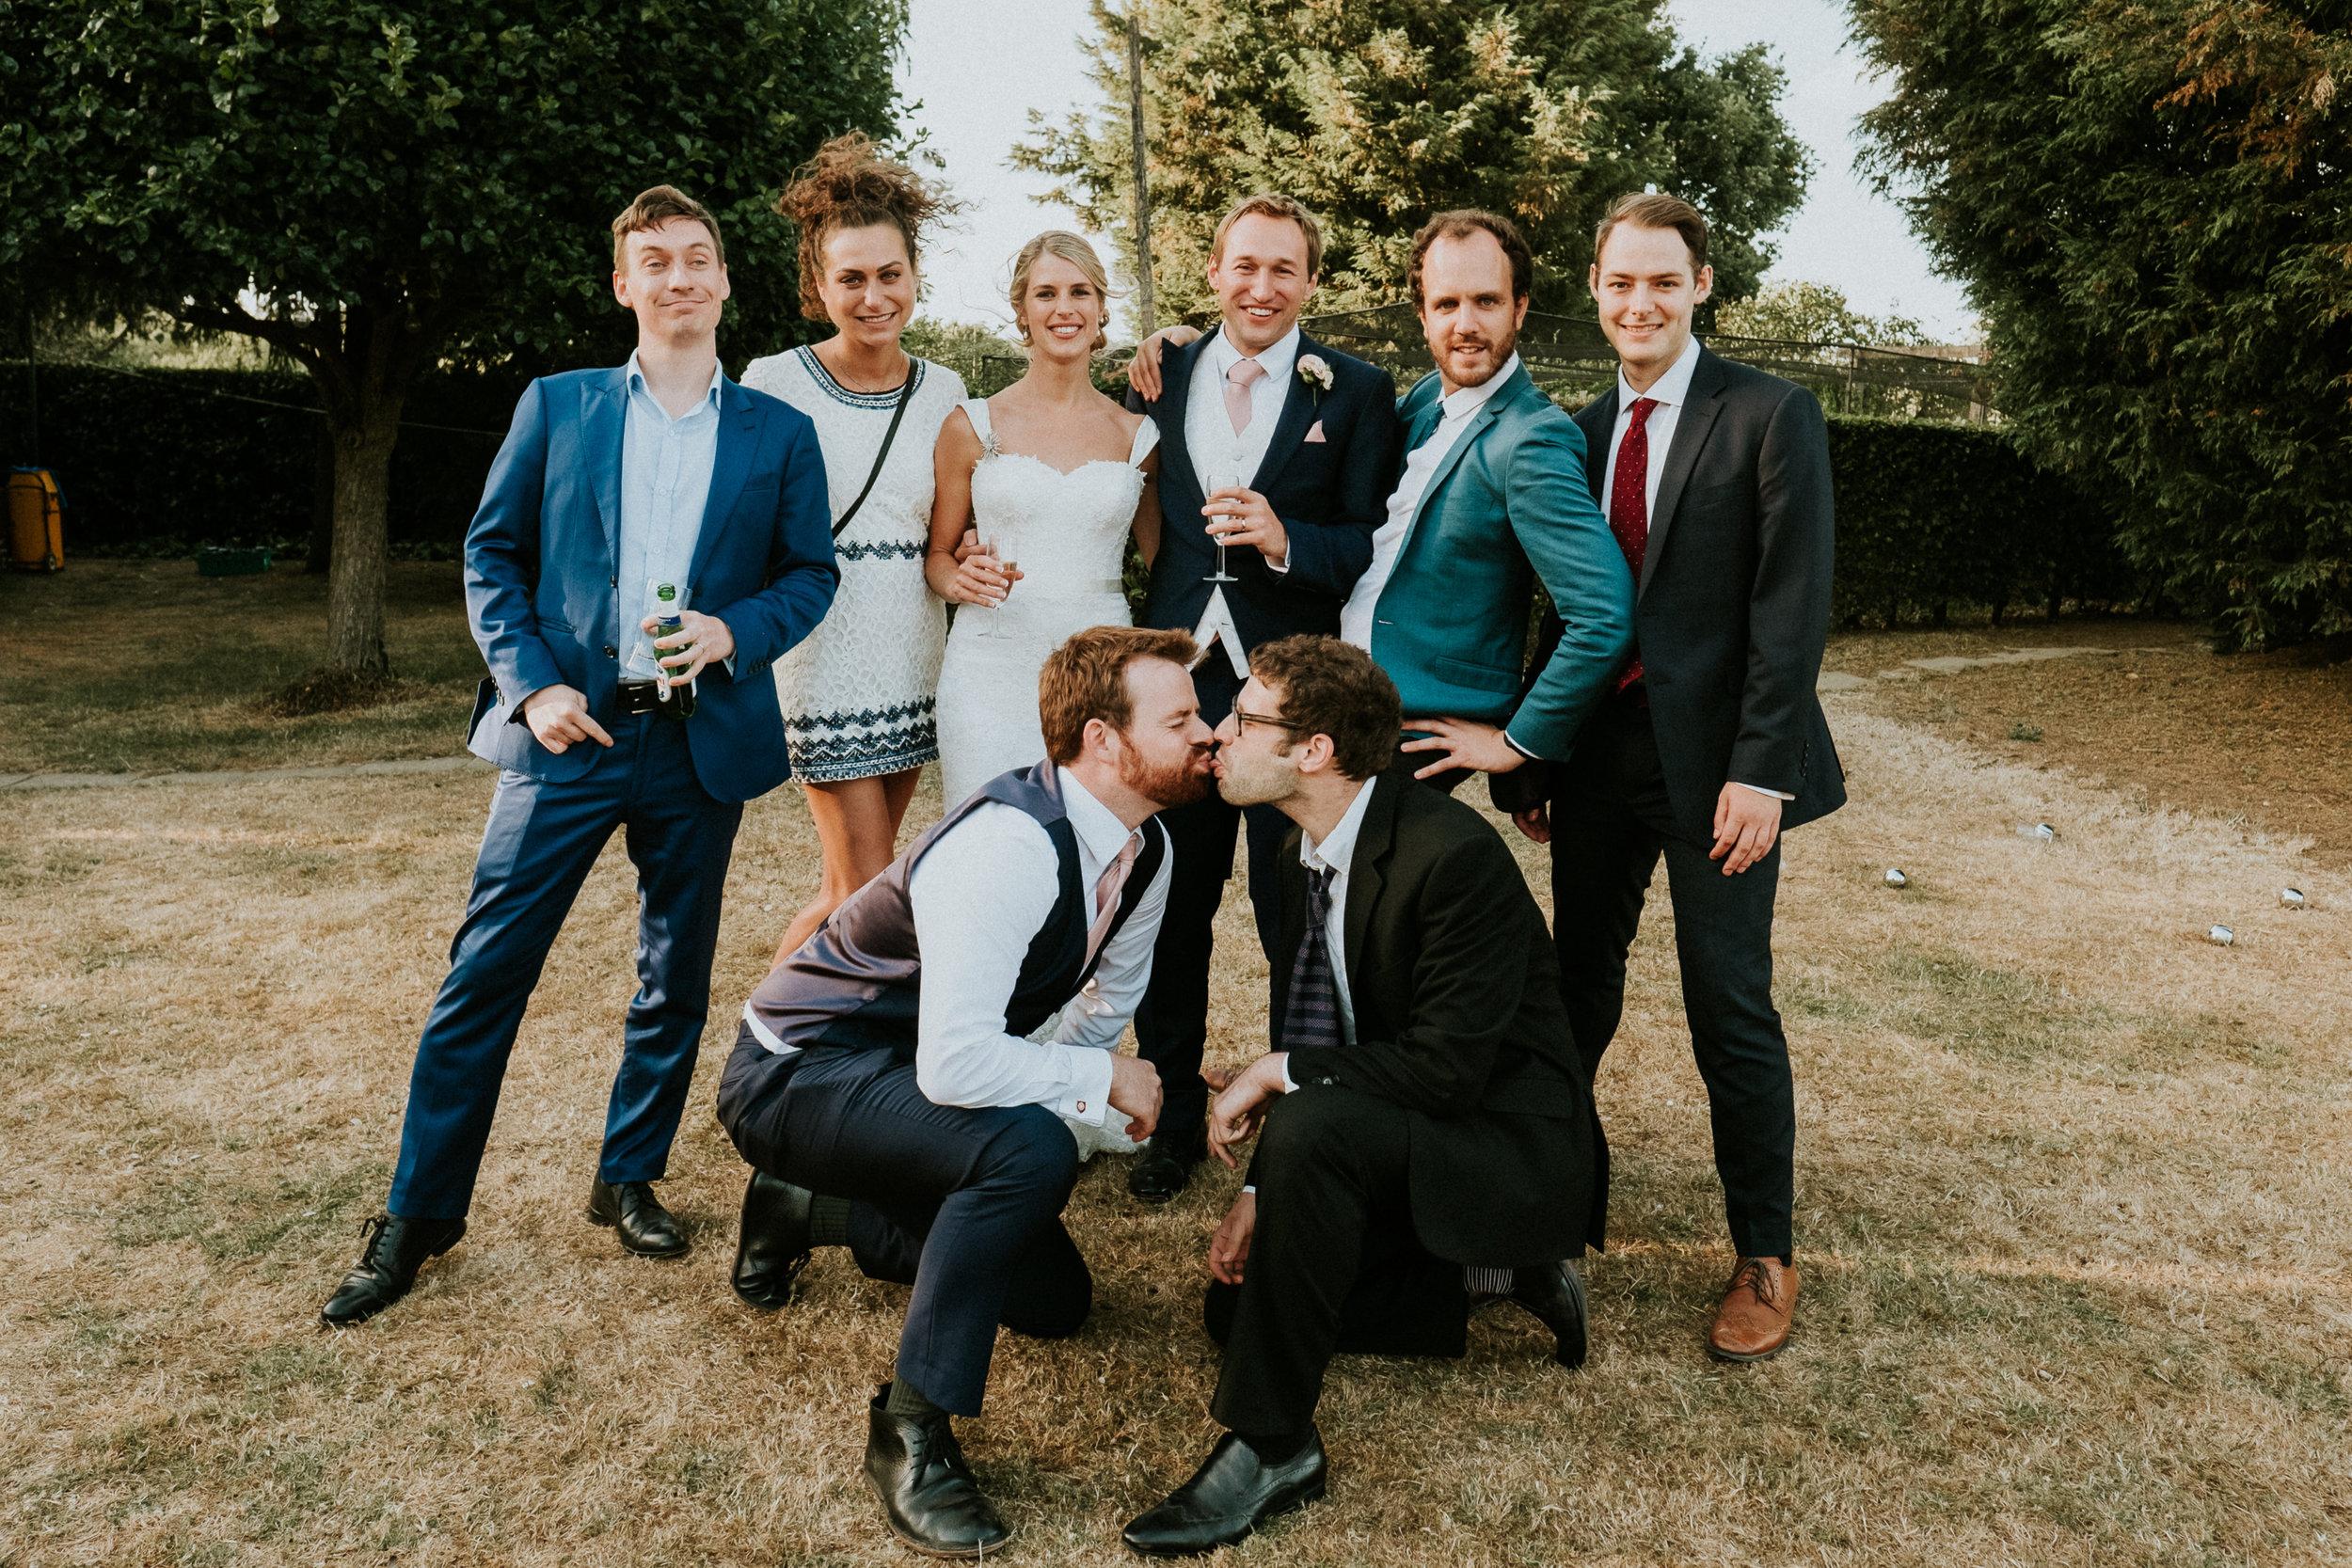 61 Norwood farm wedding photography joanna nicole4.jpg